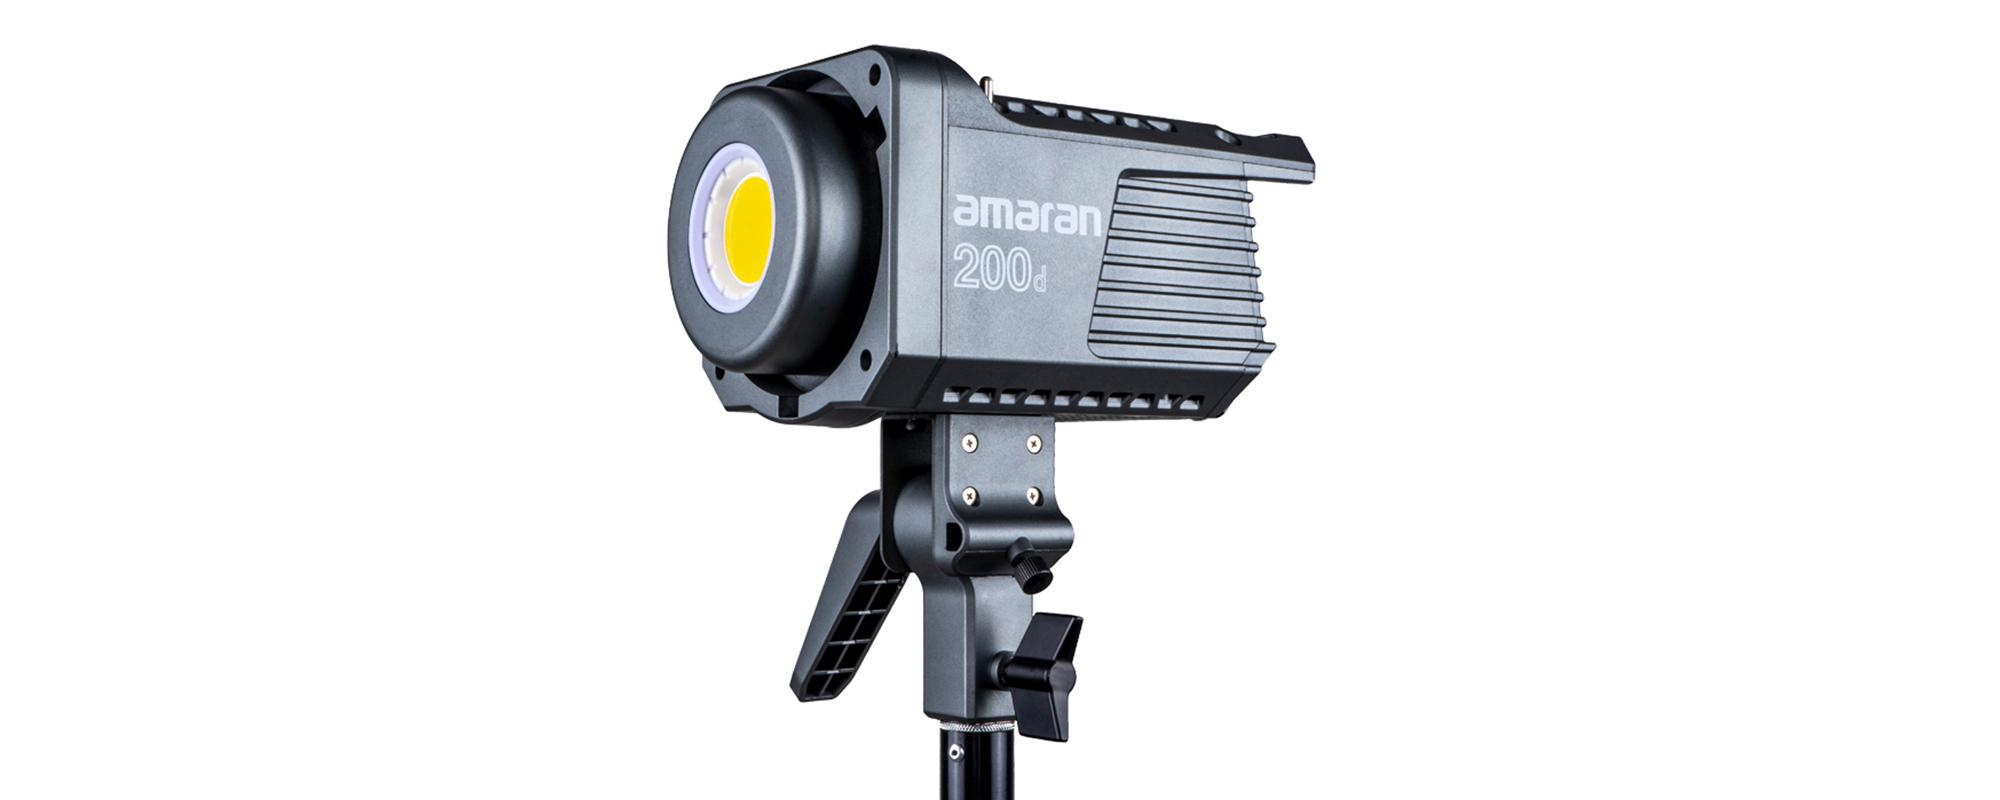 Lampa LED Amaran 200d - wierne kolory